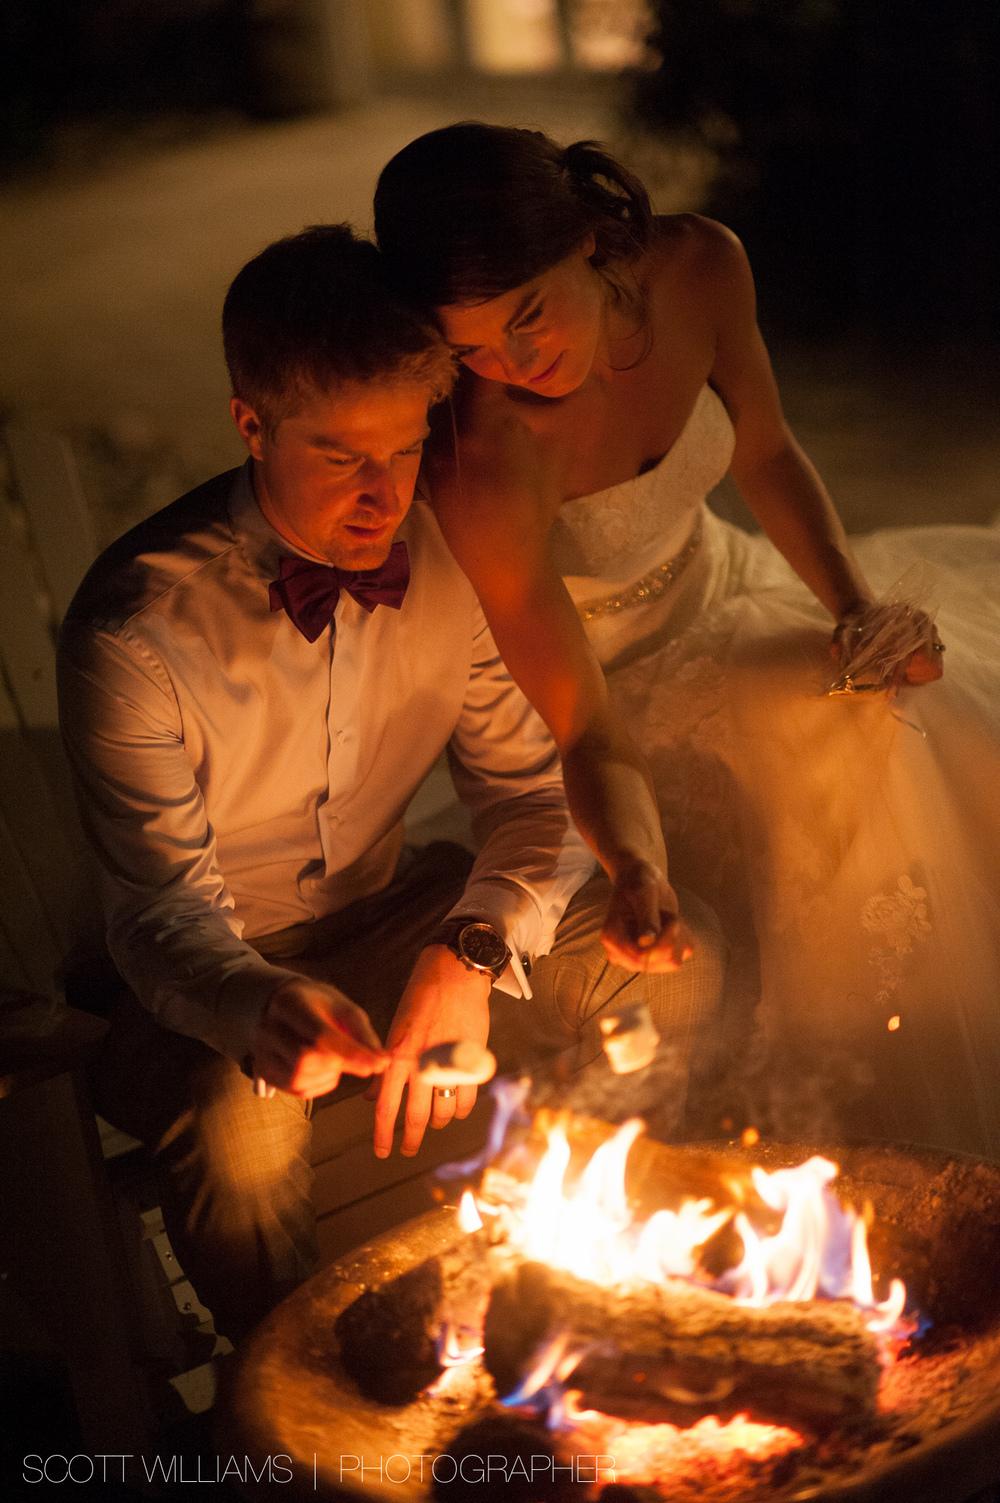 muskoka-wedding-photograph-020.jpg